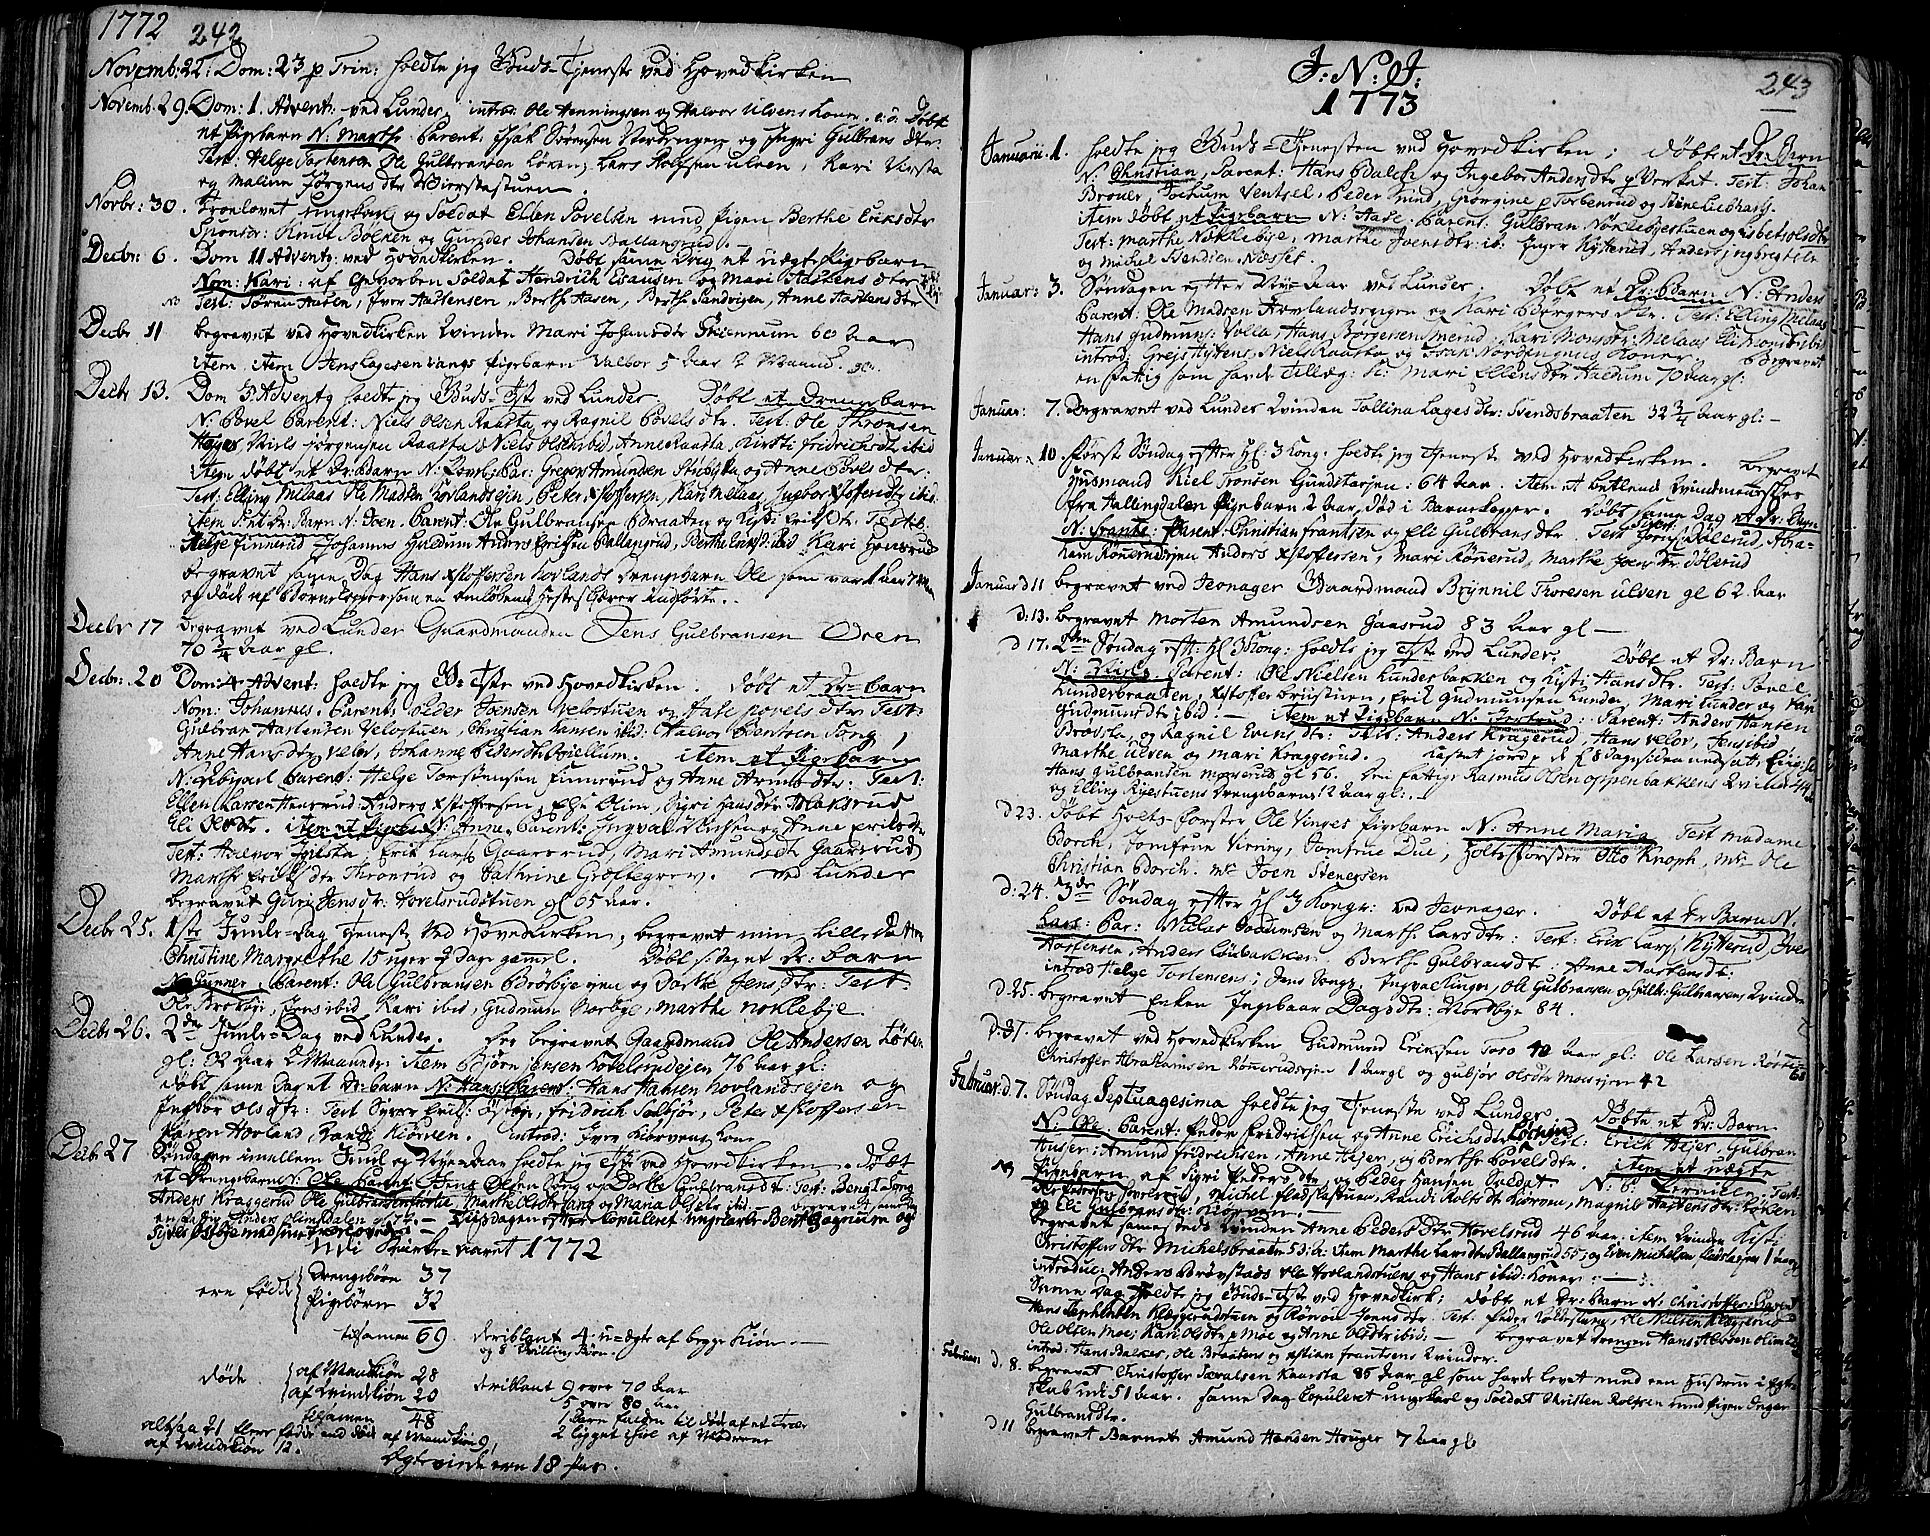 SAH, Jevnaker prestekontor, Ministerialbok nr. 3, 1752-1799, s. 242-243